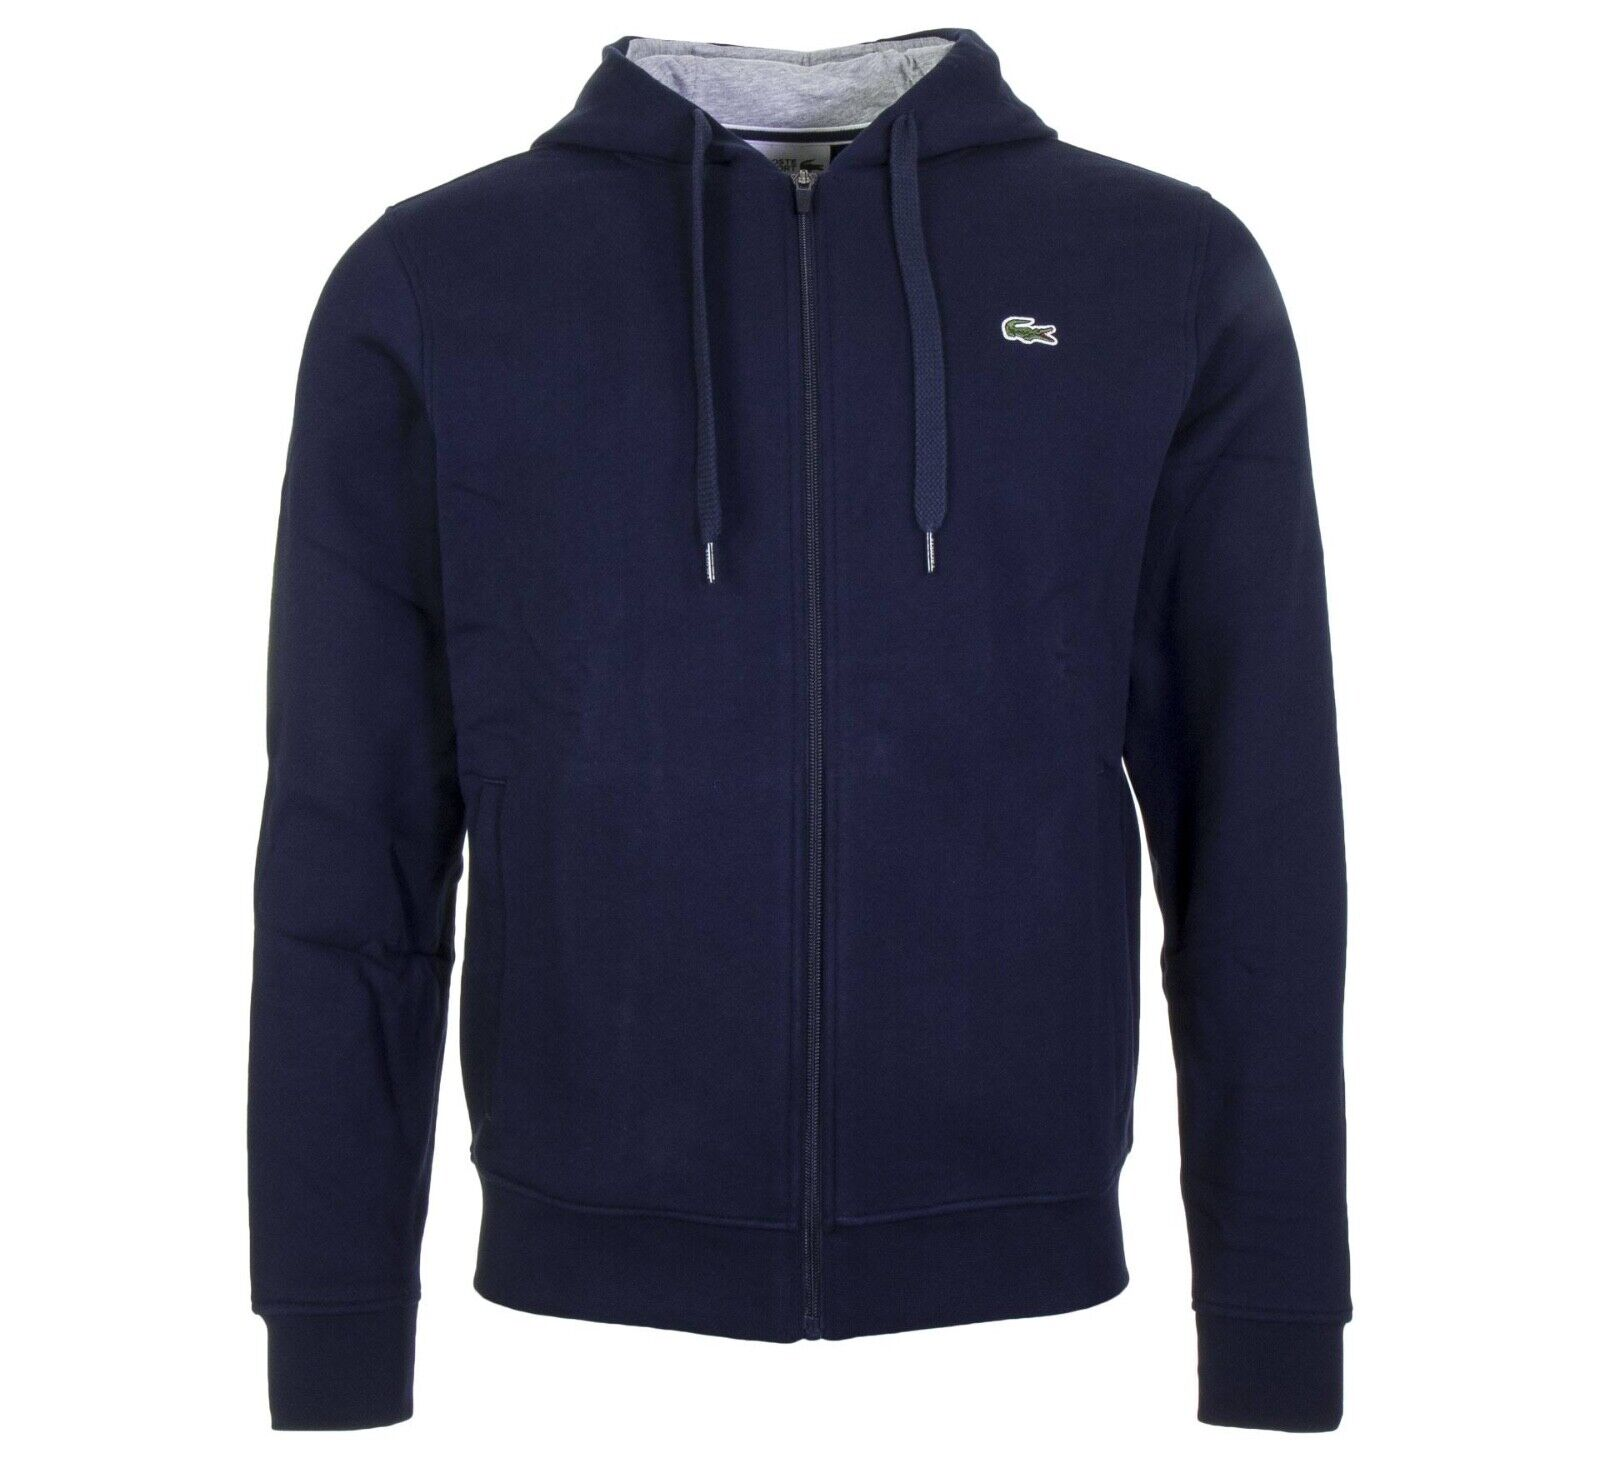 Lacoste señores sweatjacke zipjacke chaqueta Hoodie Navy azul Nuevo